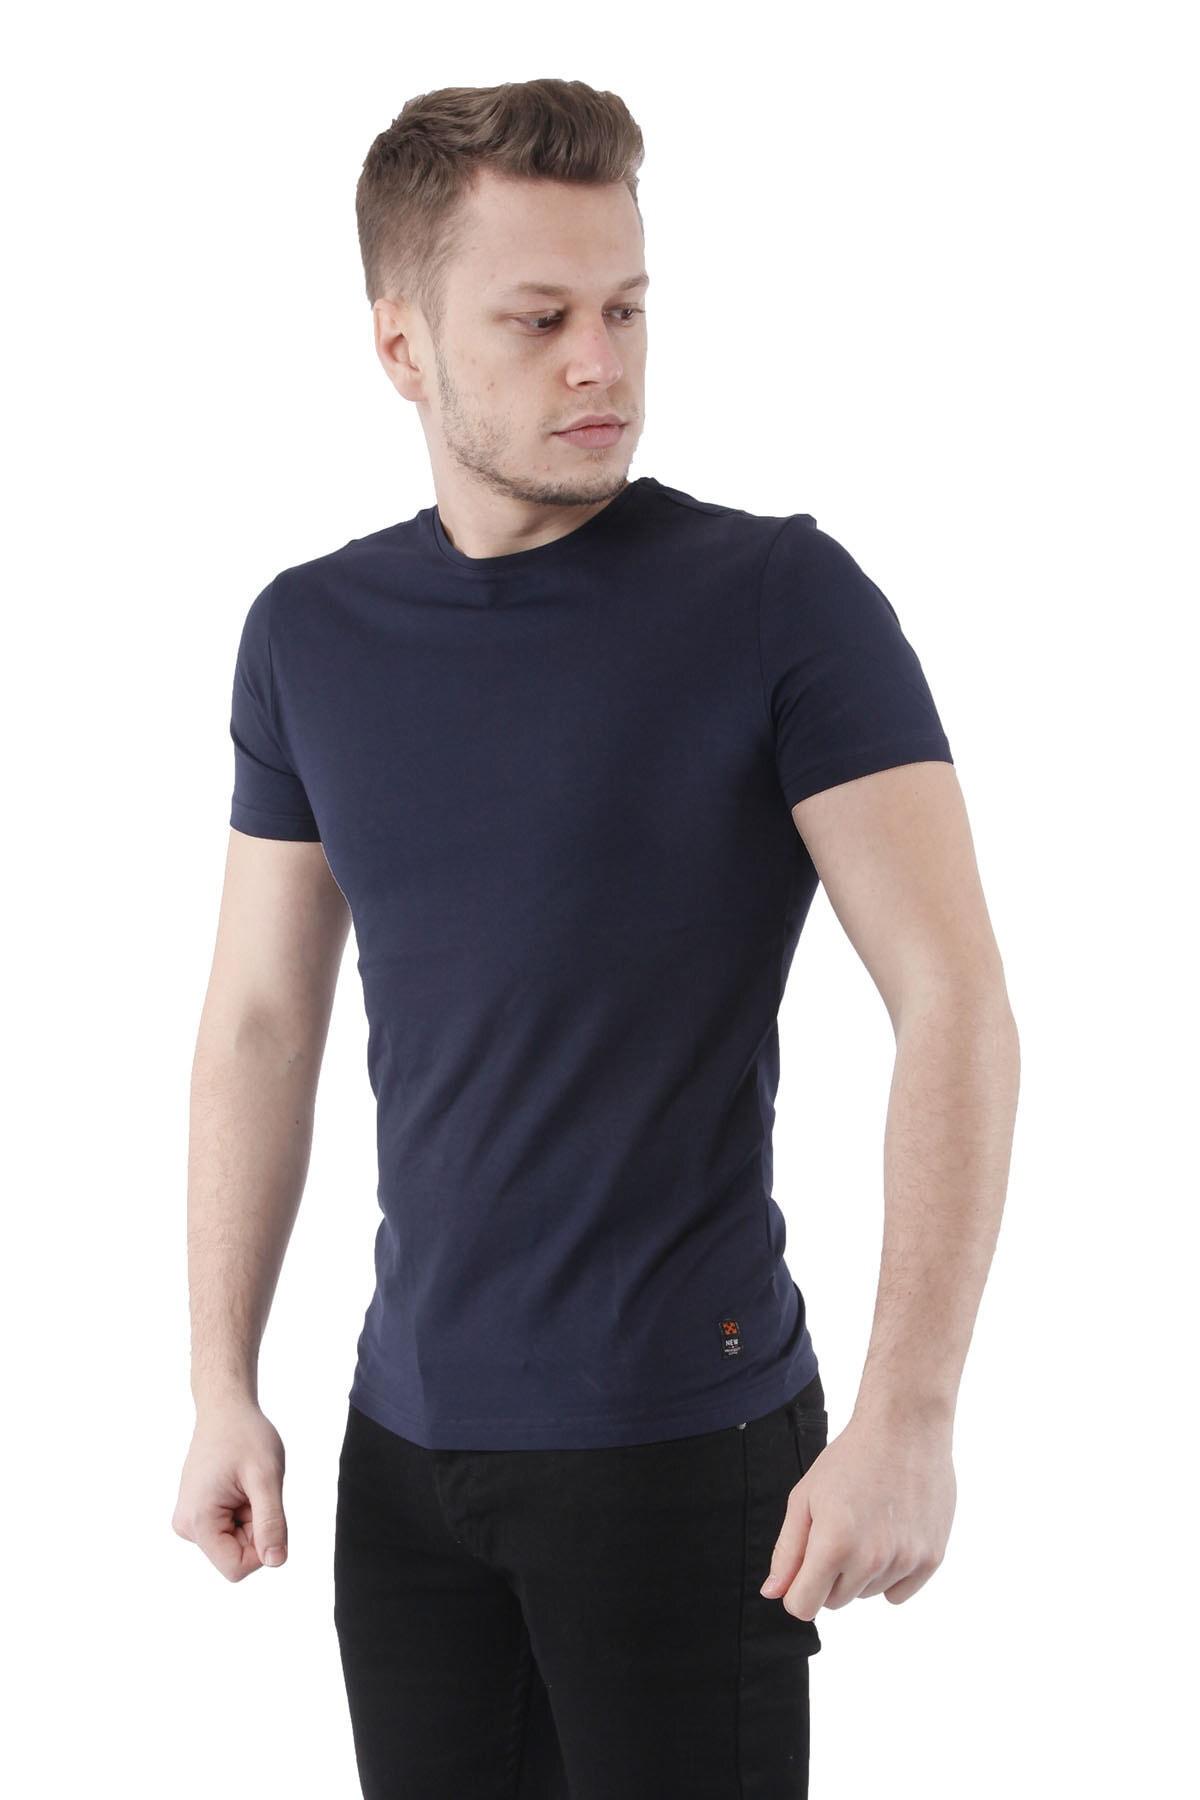 Canelia Lacivert Erkek Slimfit T-shirt 2